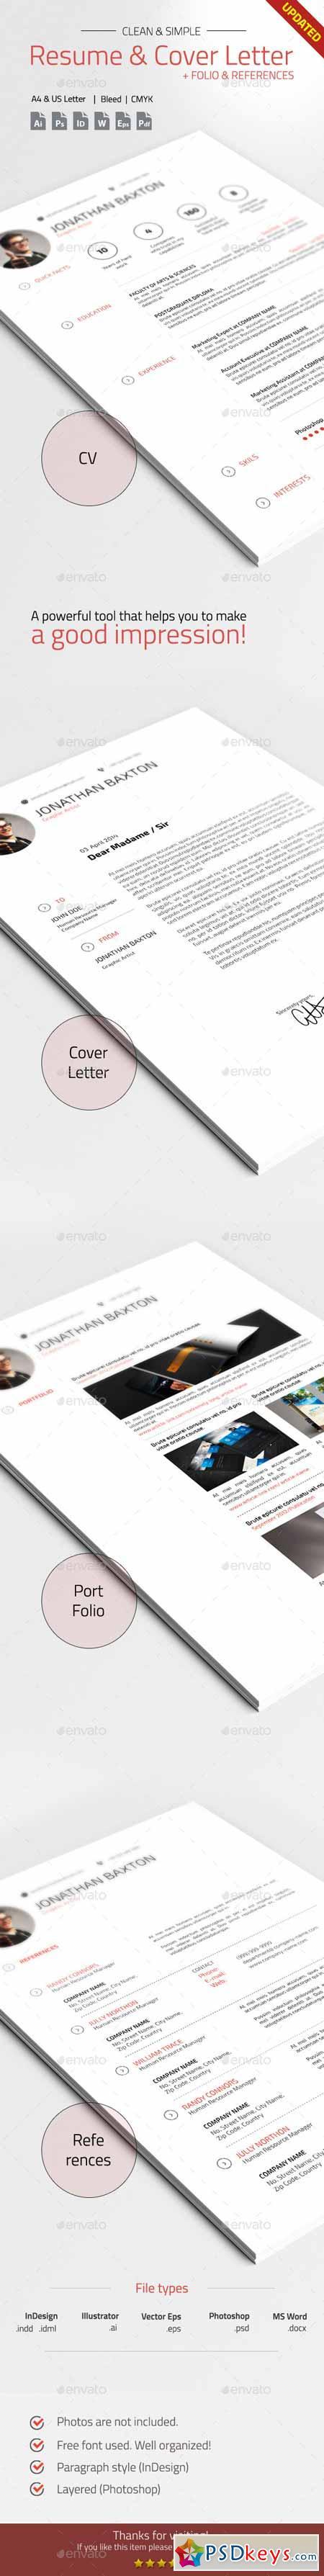 Clean Simple Resume Cv 7398472 Brushes Vectors Pinterest